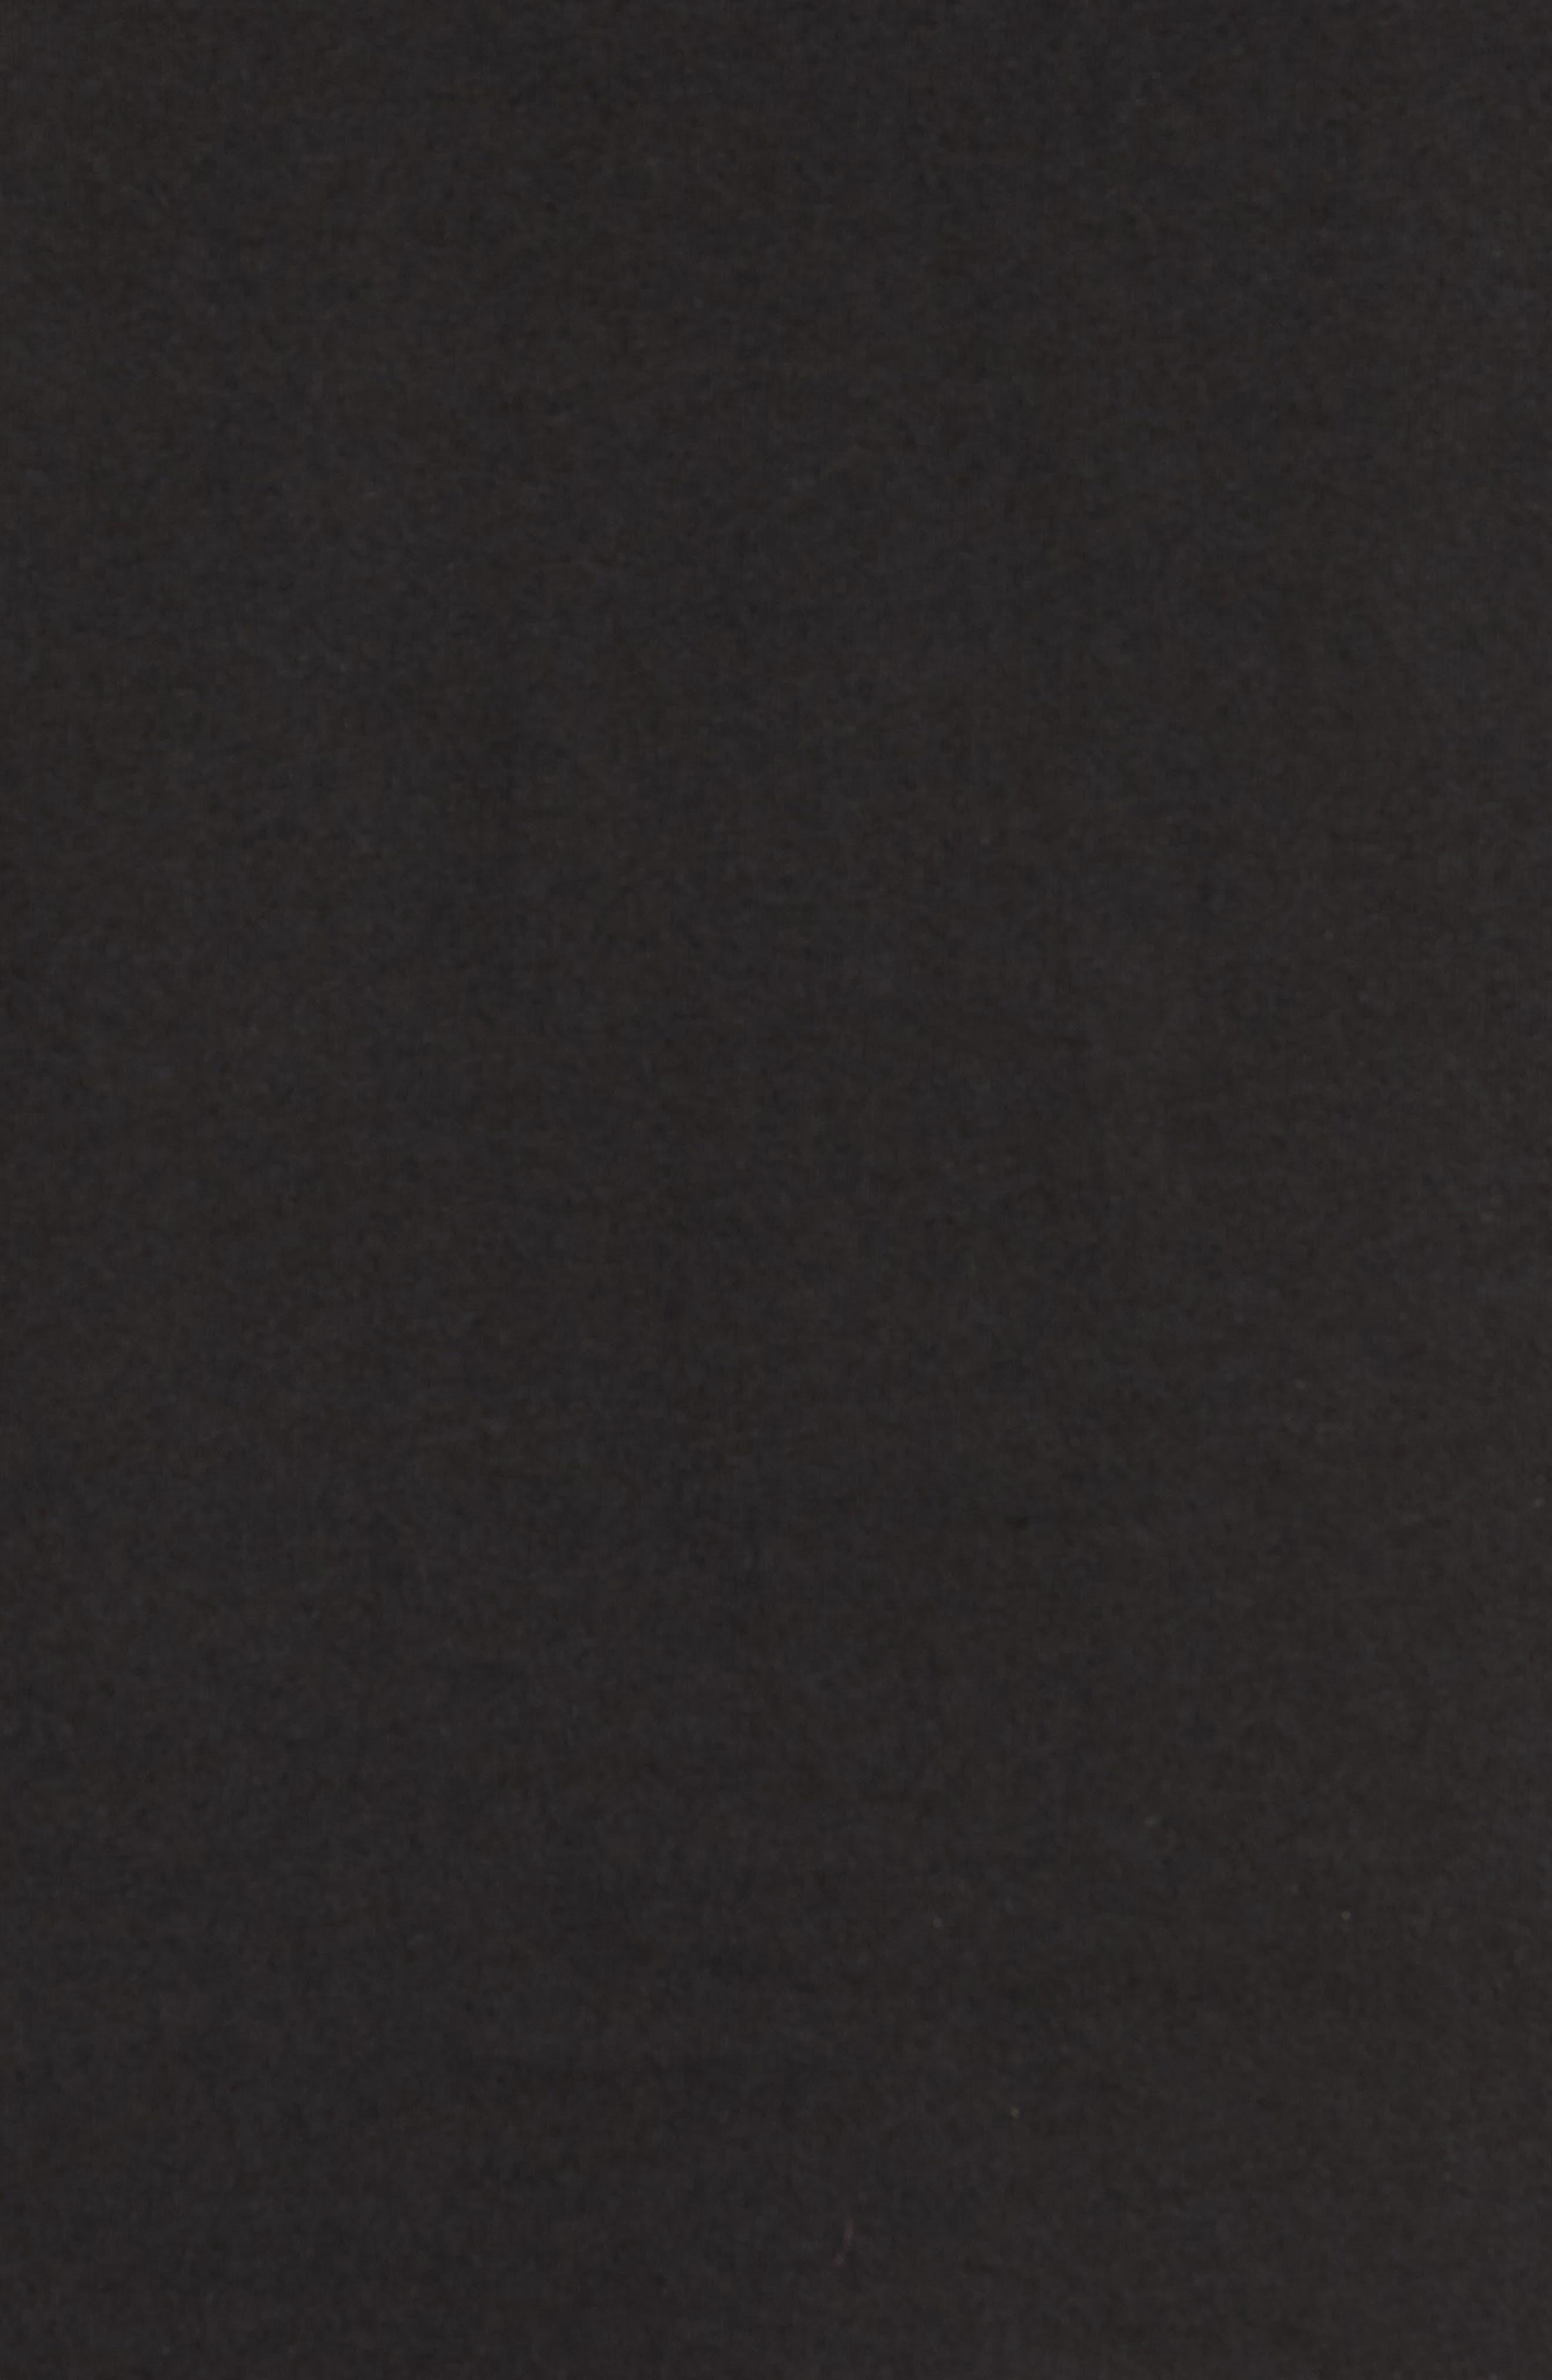 Embroidered Slash T-Shirt,                             Alternate thumbnail 5, color,                             Black